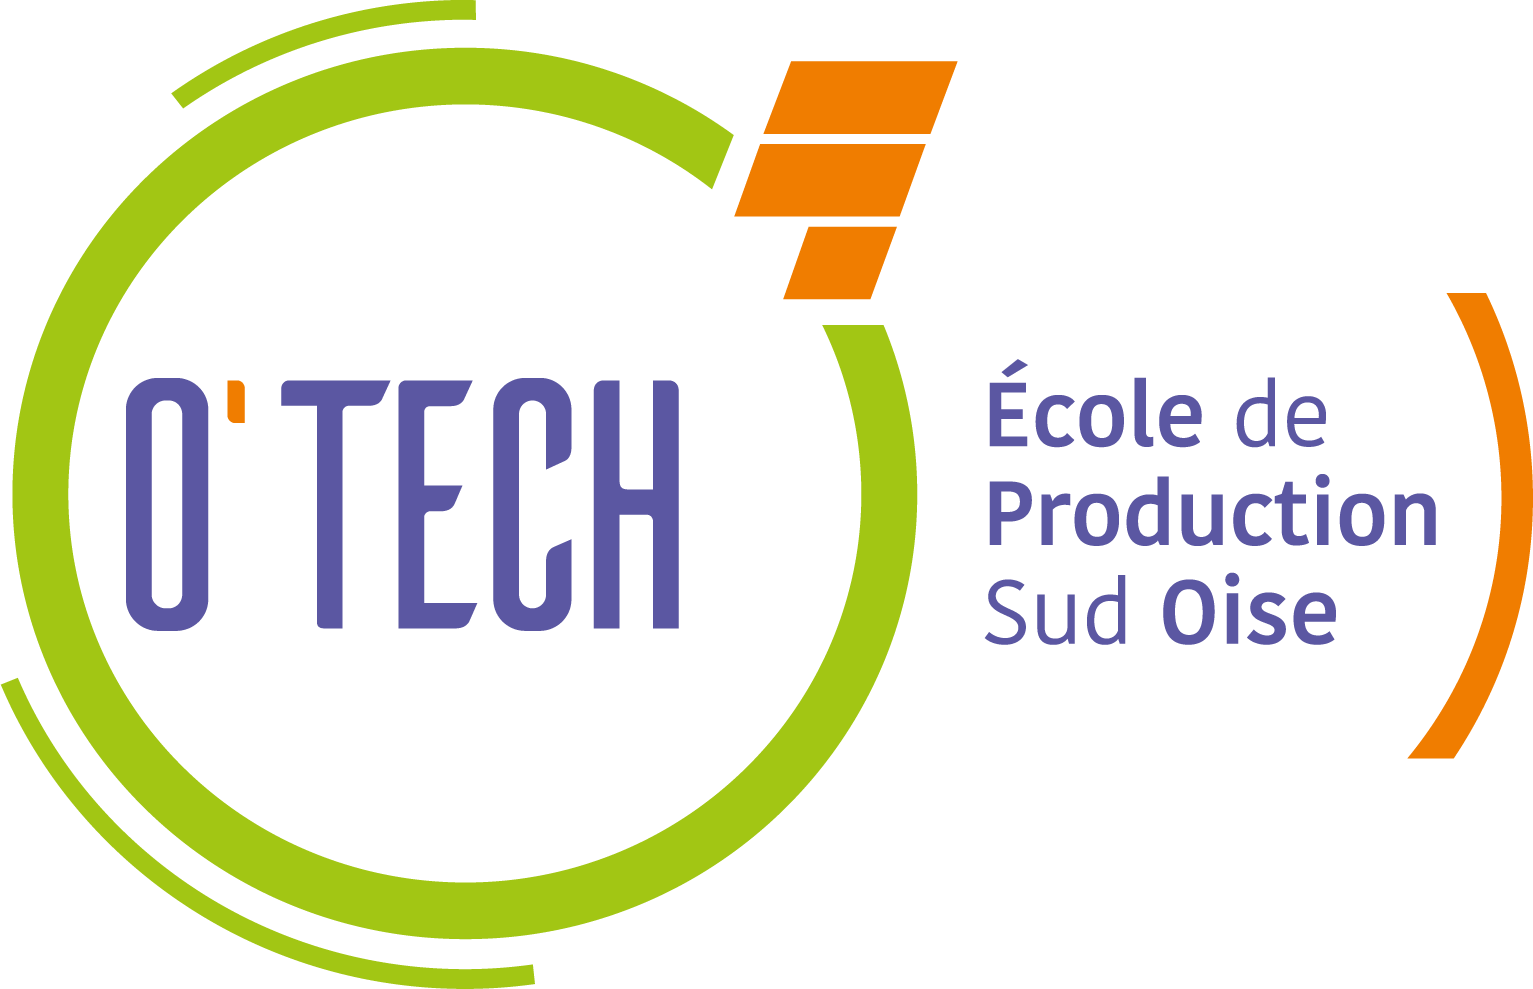 O'TECH Ecole de Production Sud-Oise